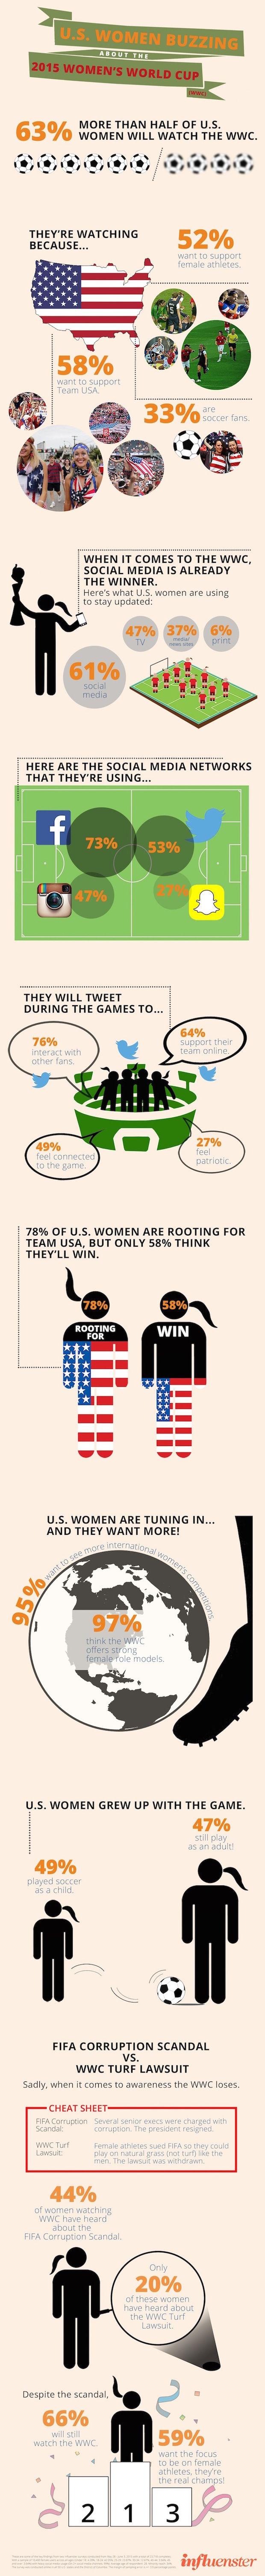 infographic Vrouwenvoetbal